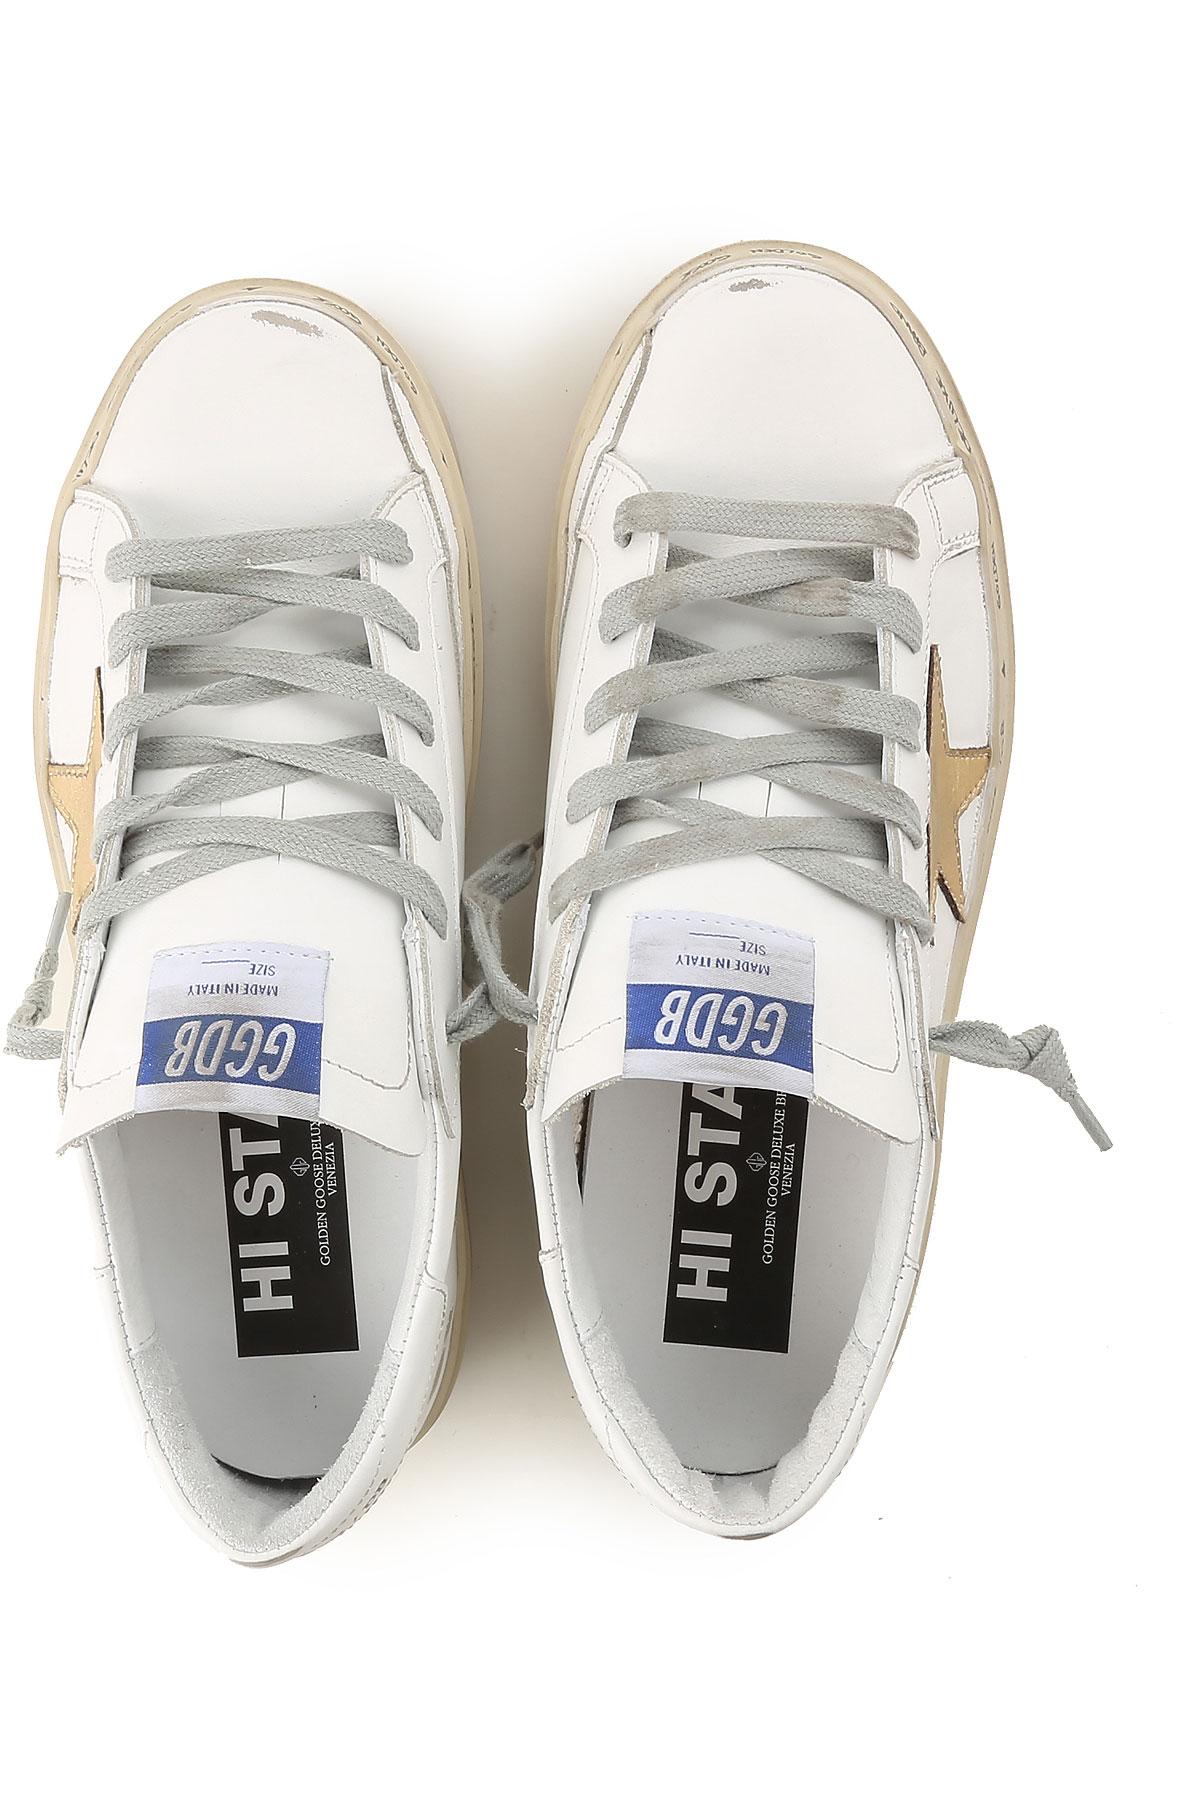 Golden Primavera Para Zapatos nbsp; Blanco Mujer verano Goose 2019 IvrBqI